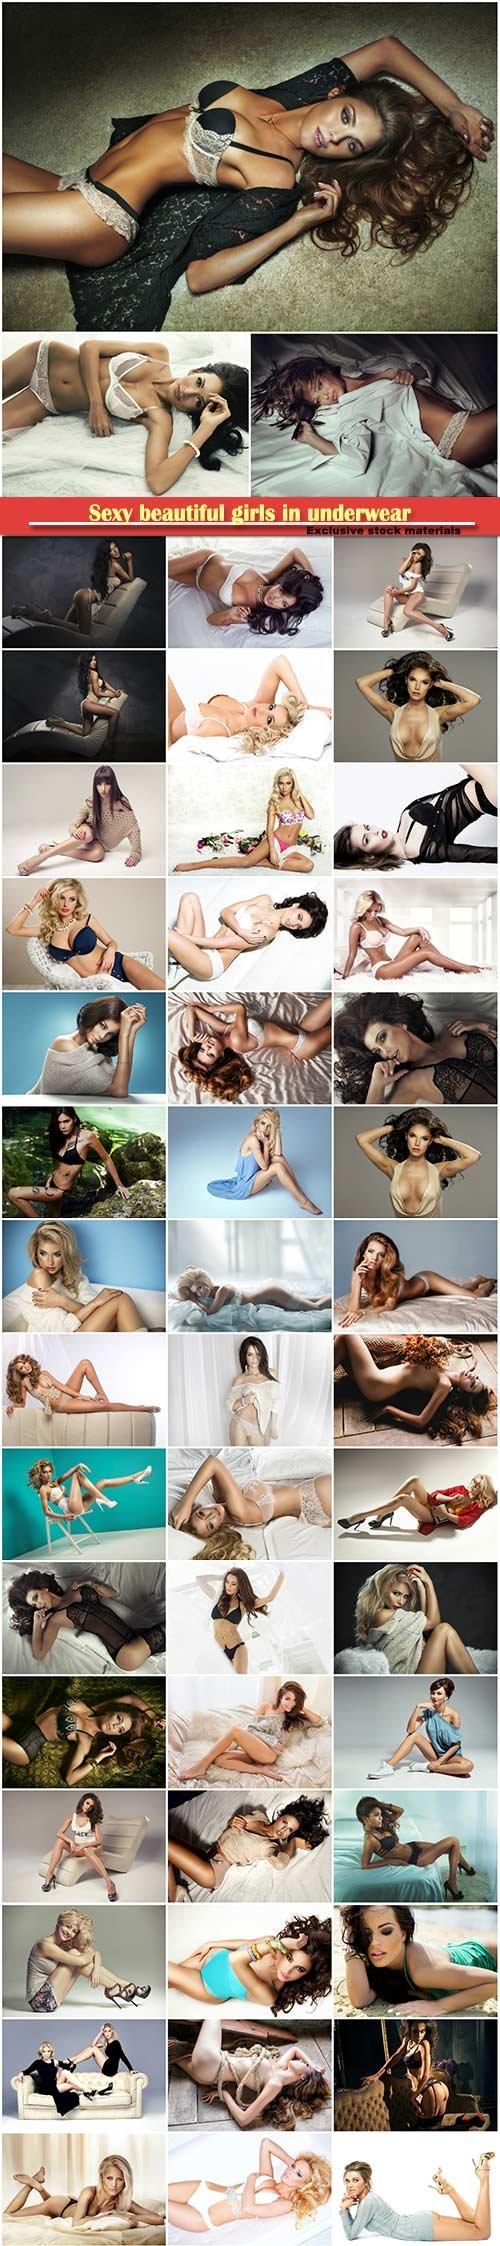 Sexy beautiful girls in underwear # 2